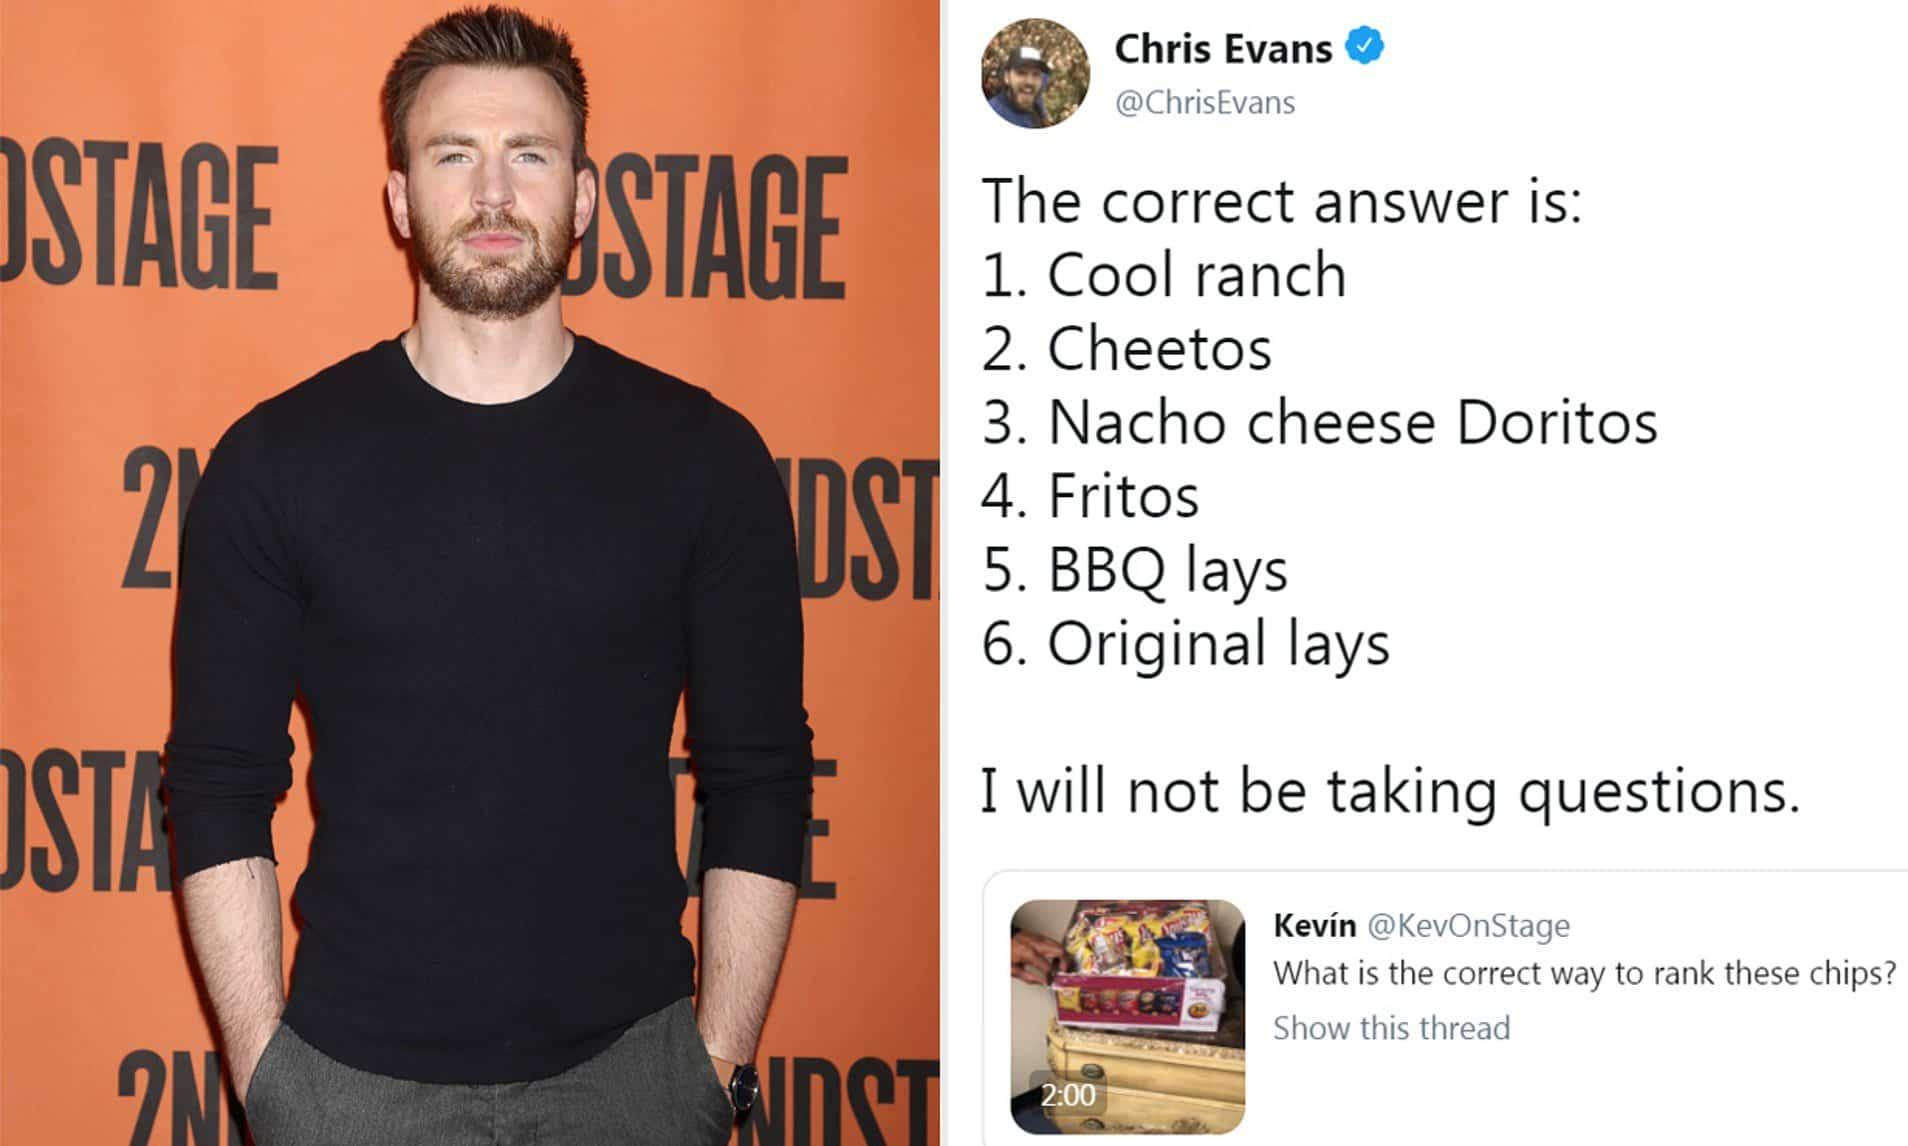 Chris Evans Favorite Crisps Brand